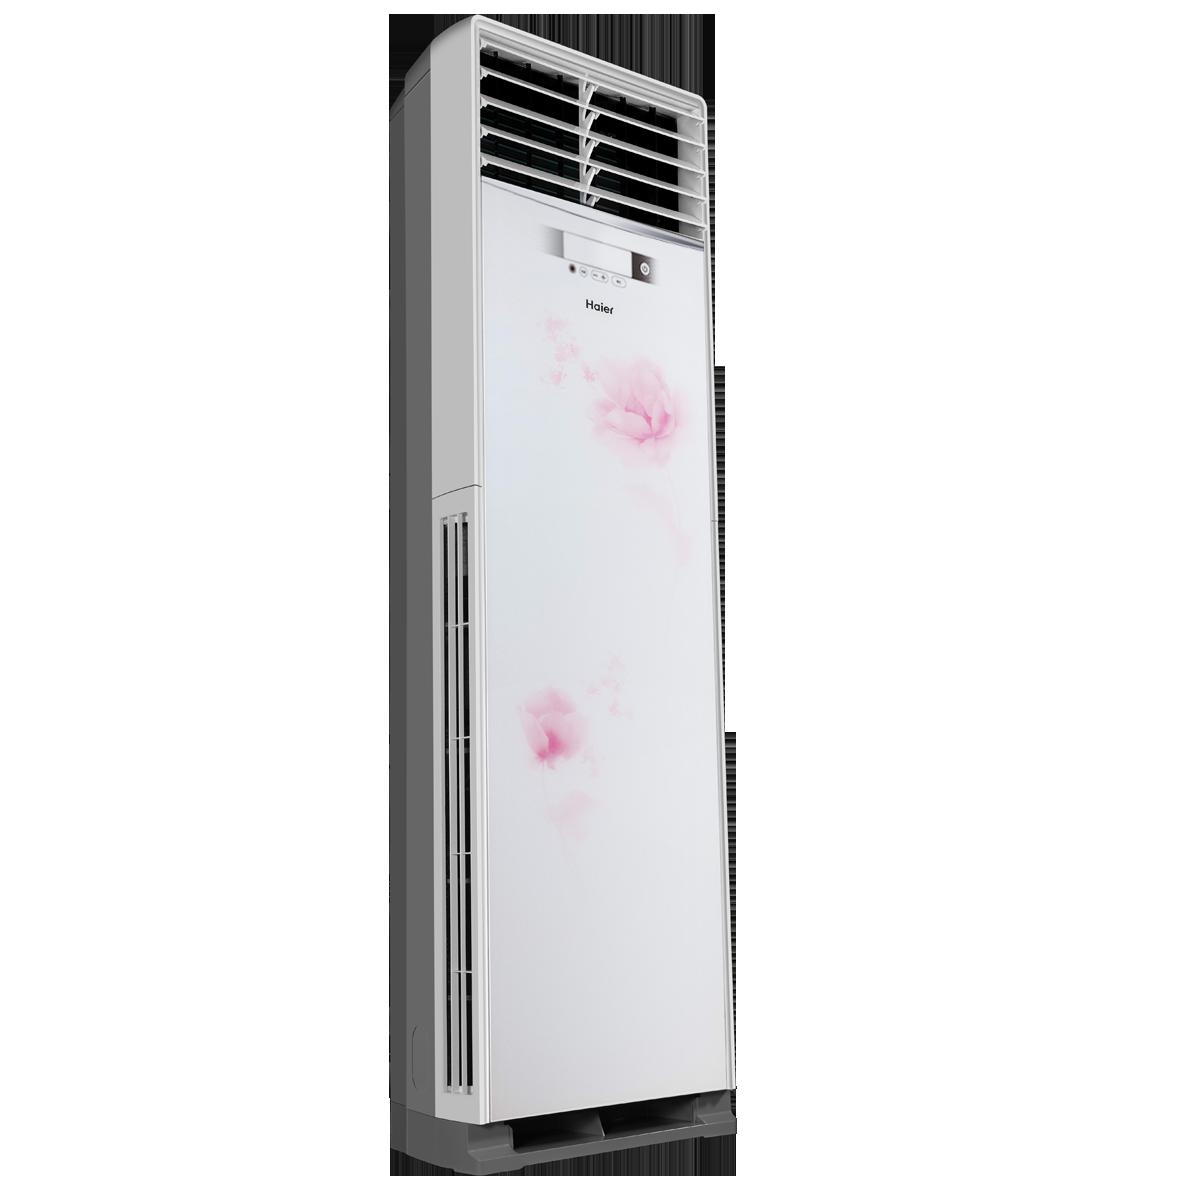 Haier/海尔                         高效定频柜式空调                         KFR-50LW/02HBF12套机(天香牡丹)